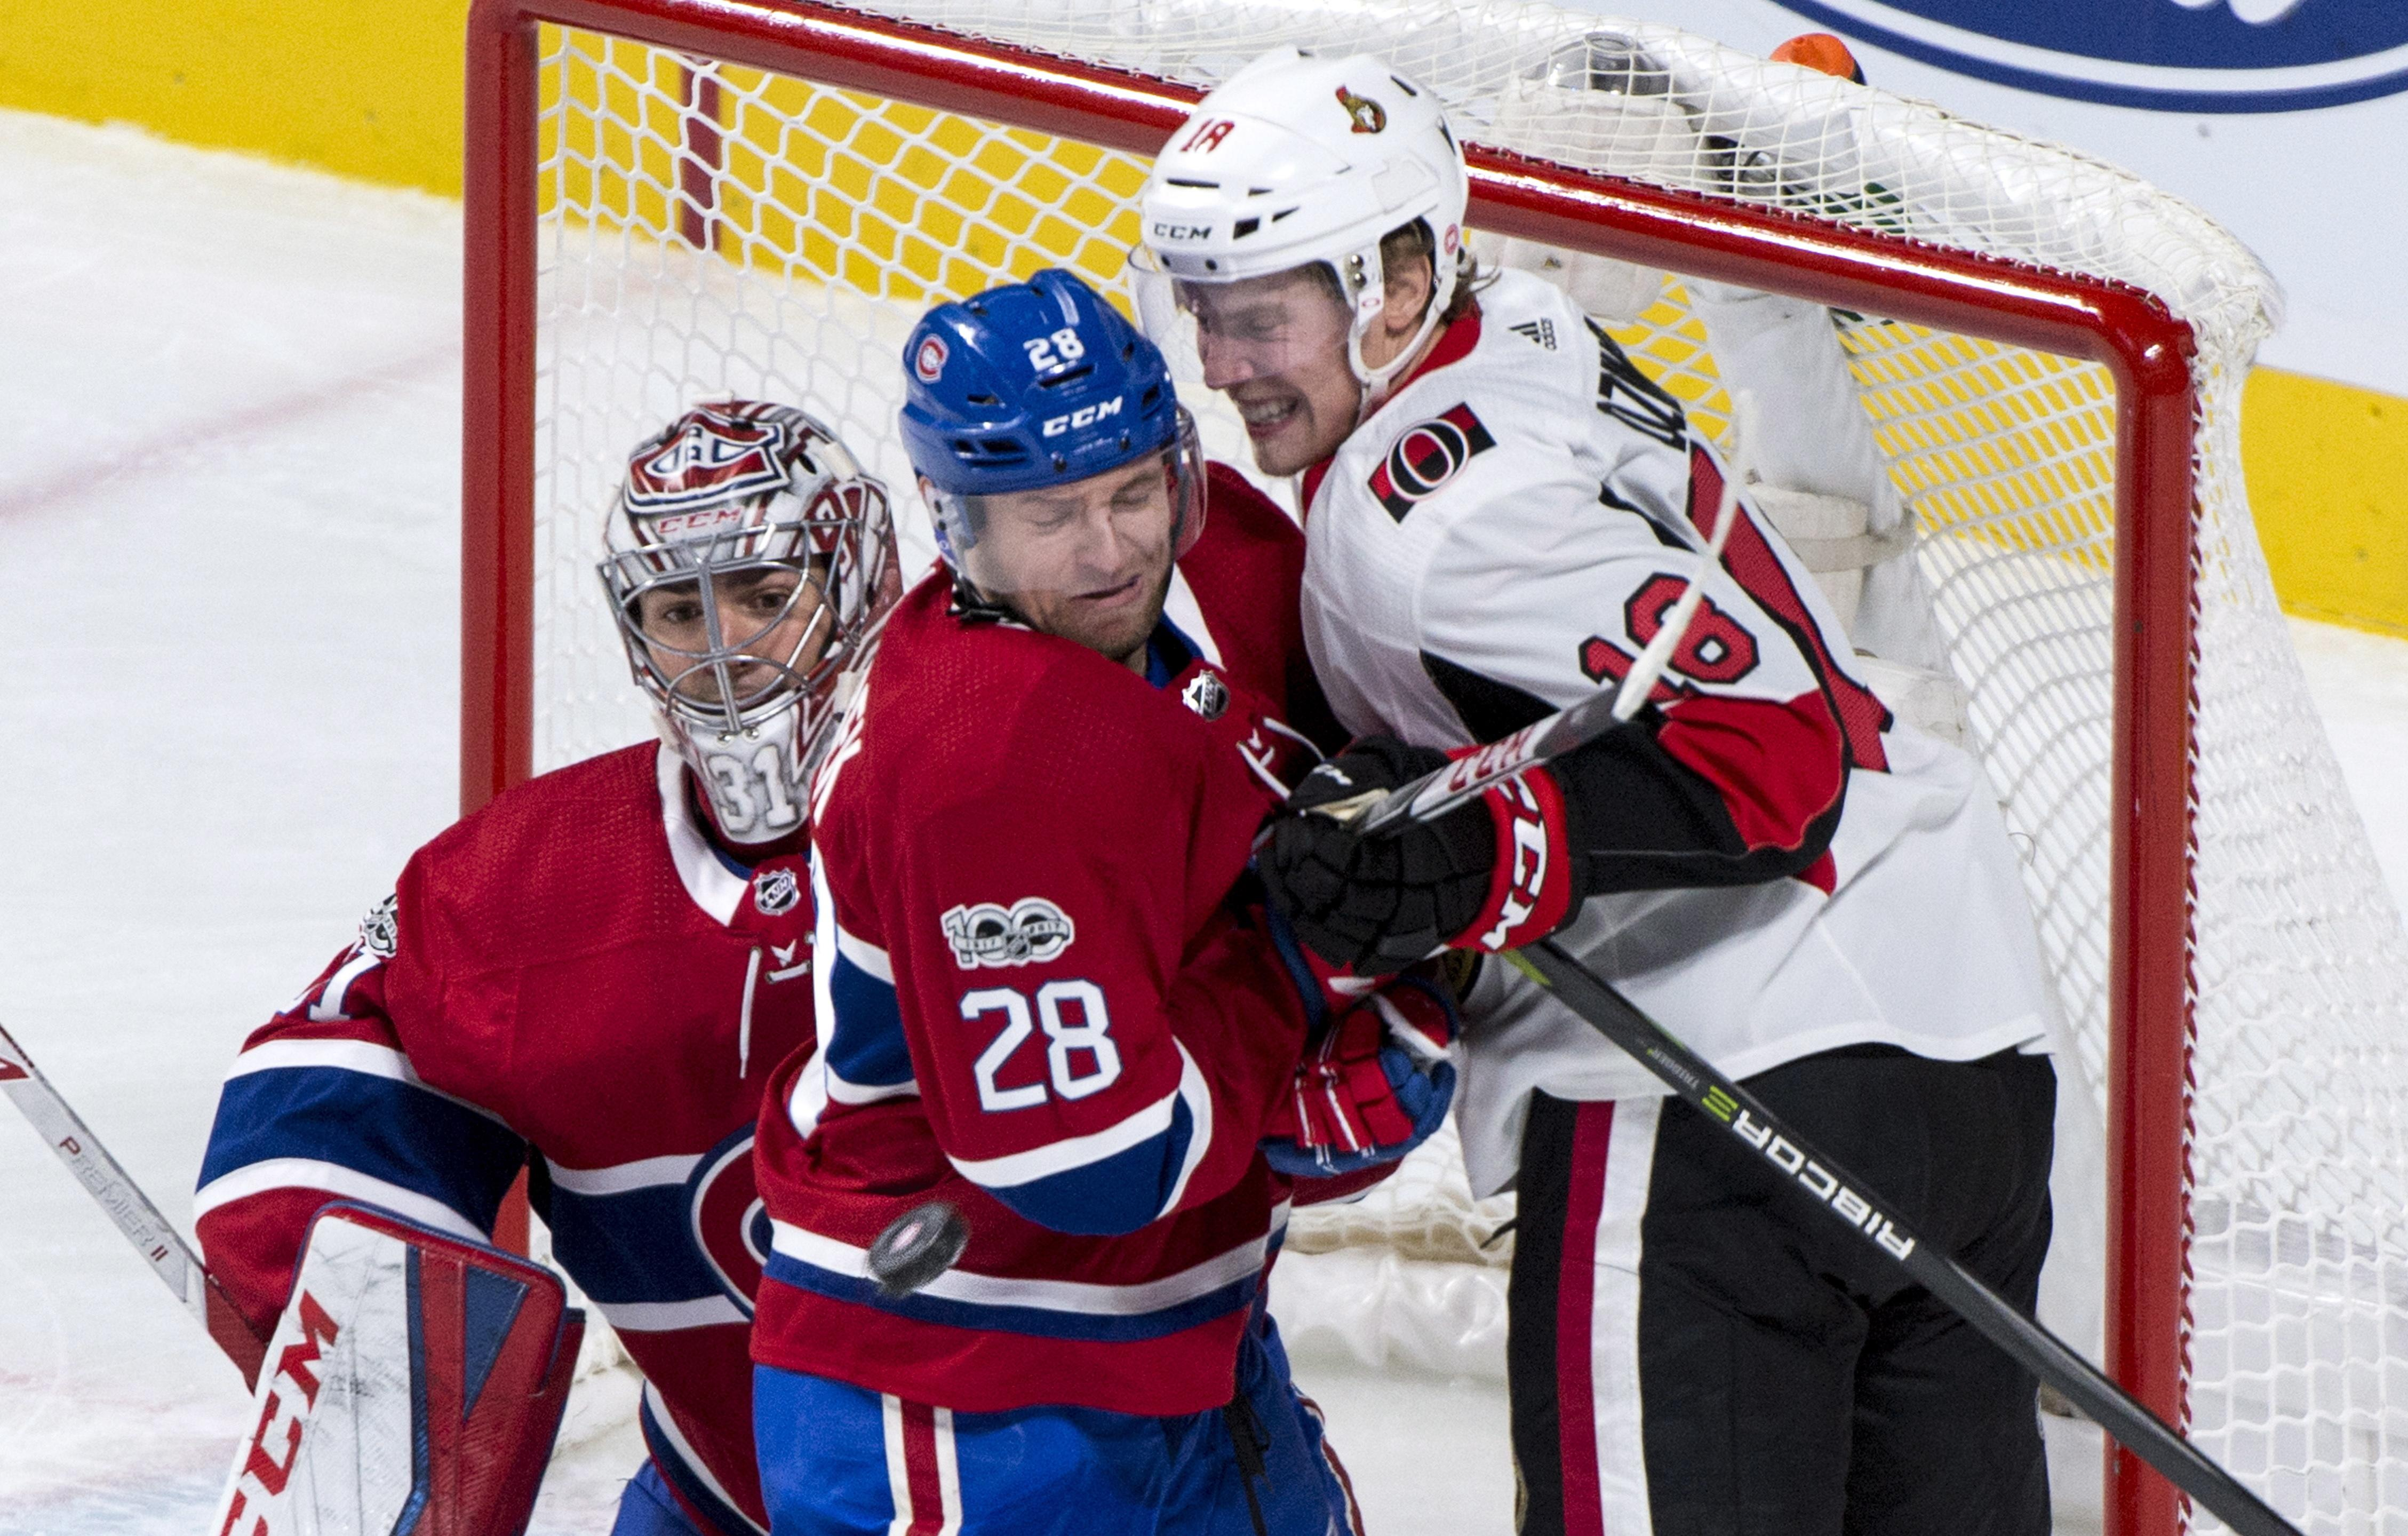 Senators_canadiens_hockey_78103